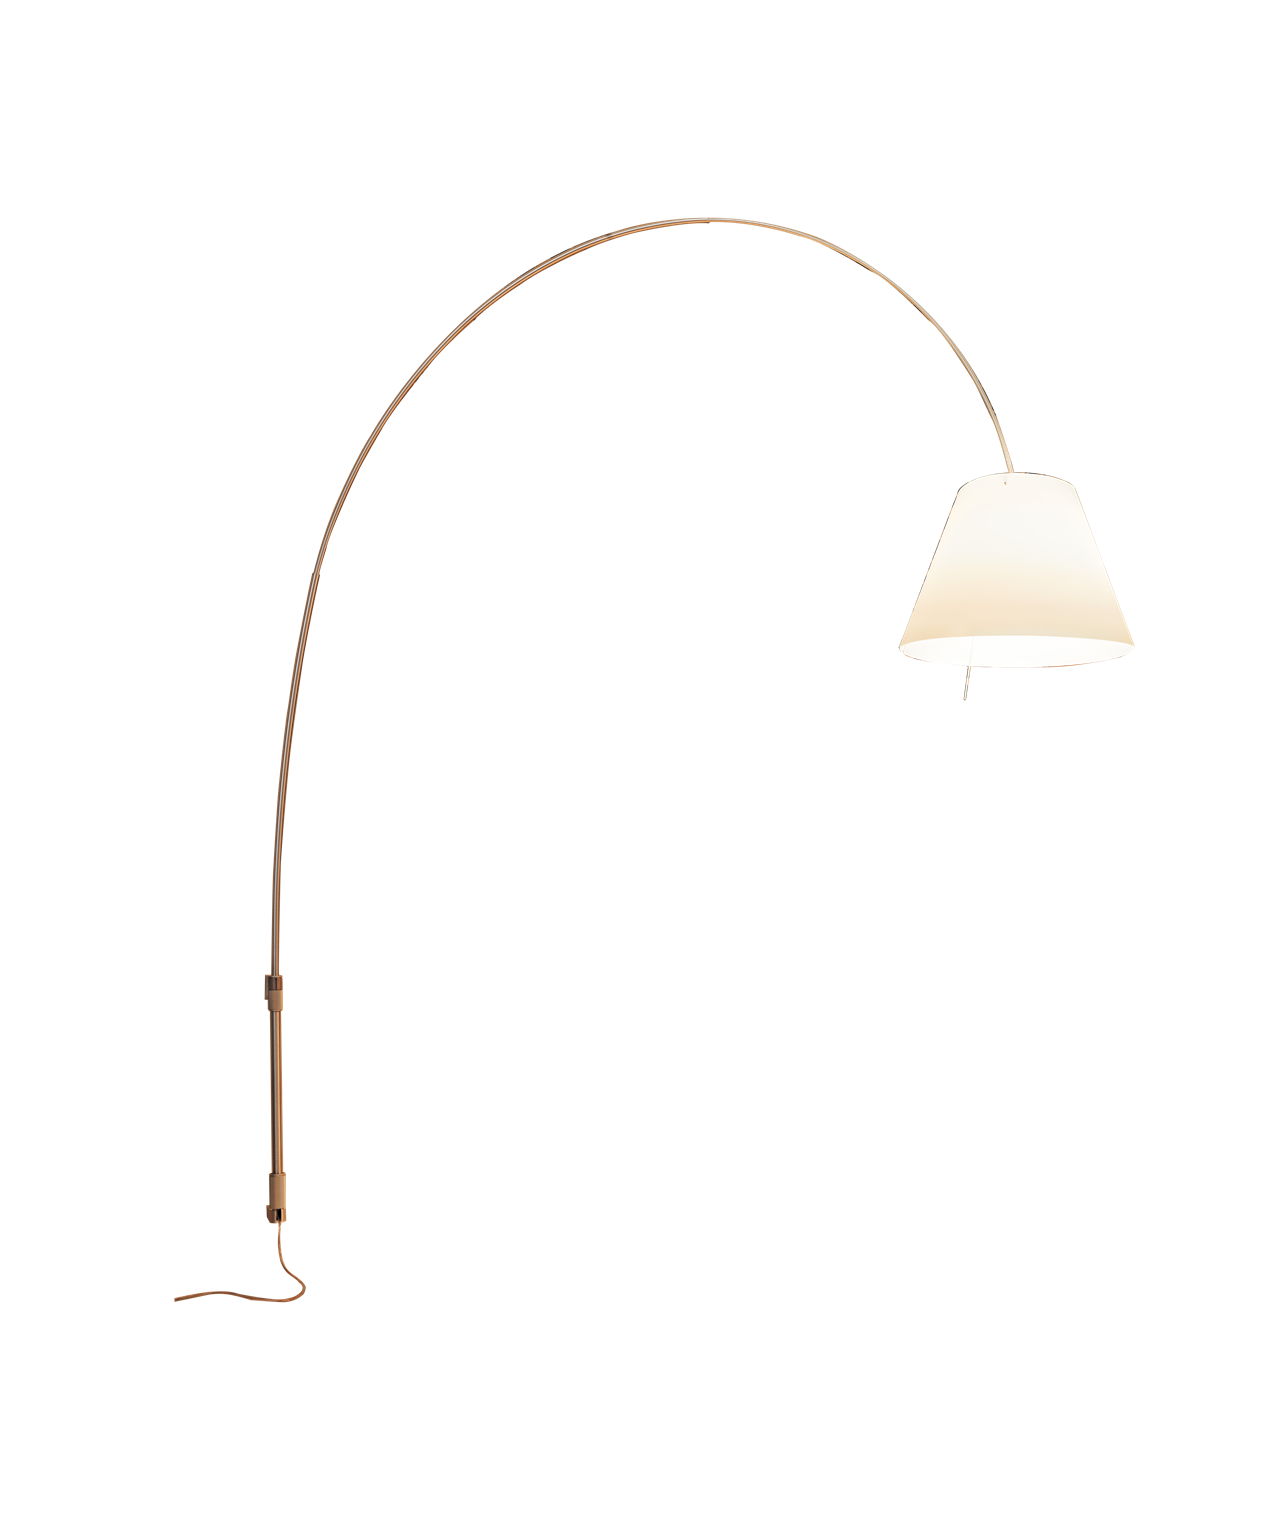 Lady Costanza Gulvlampe/Væglampe - Luceplan